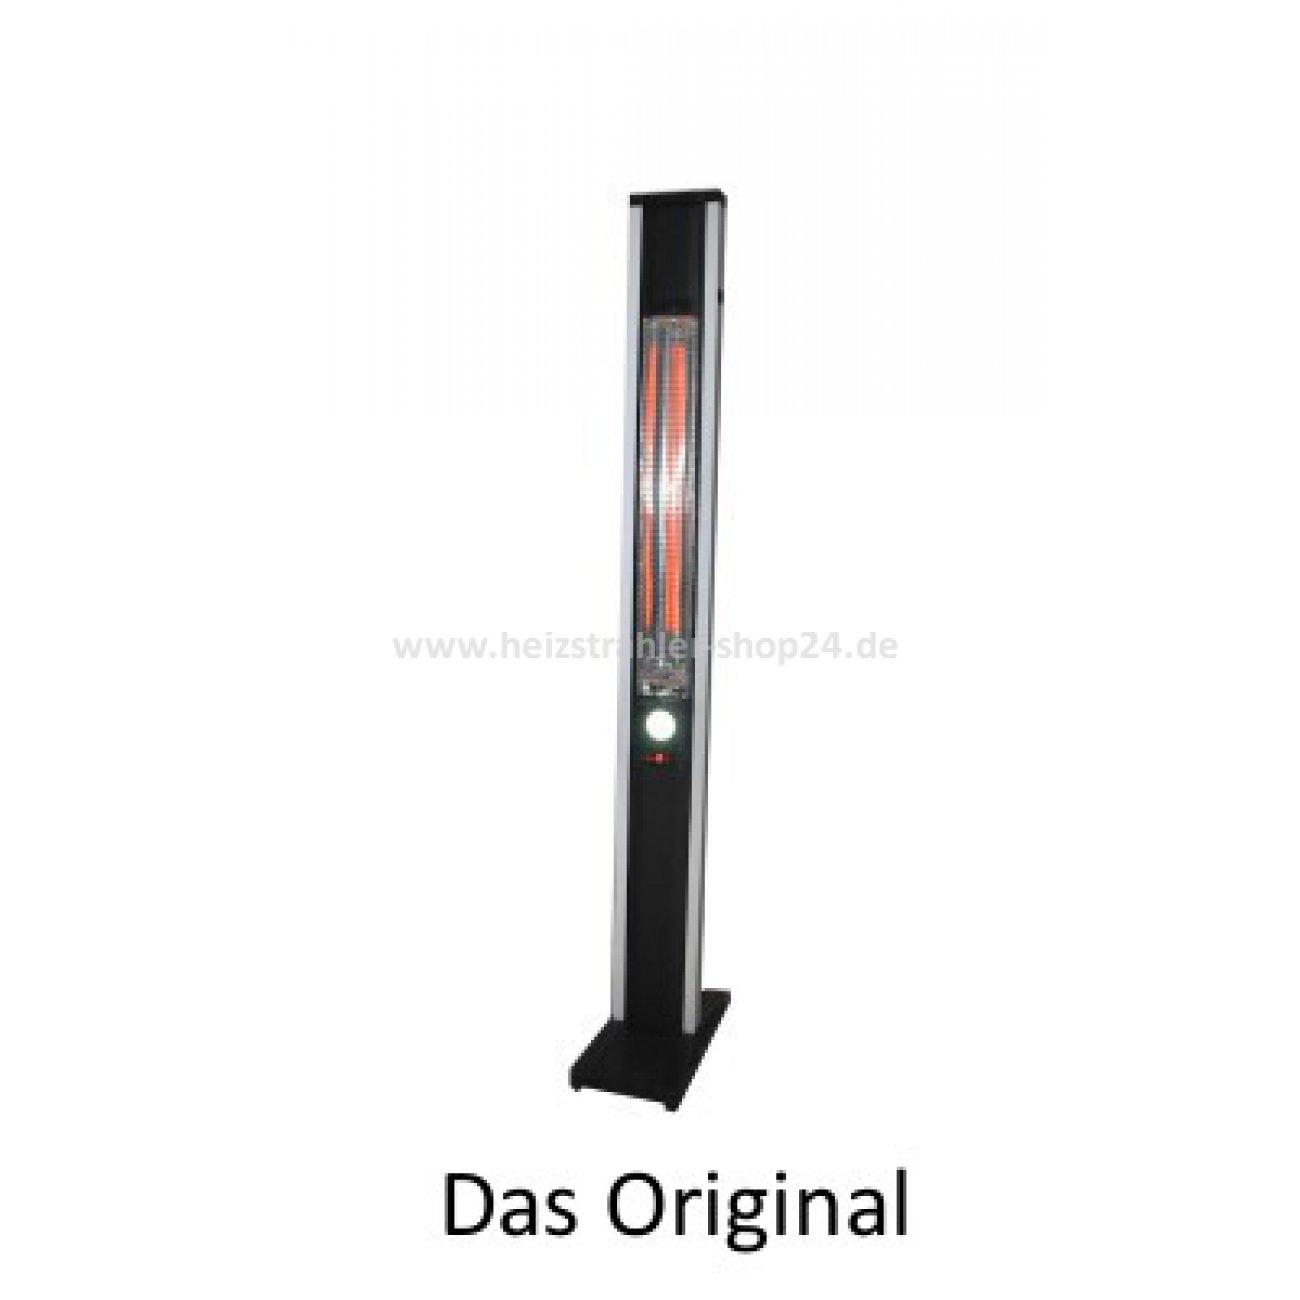 alpina infrarot heizstrahler bali mit schwenkarm. Black Bedroom Furniture Sets. Home Design Ideas